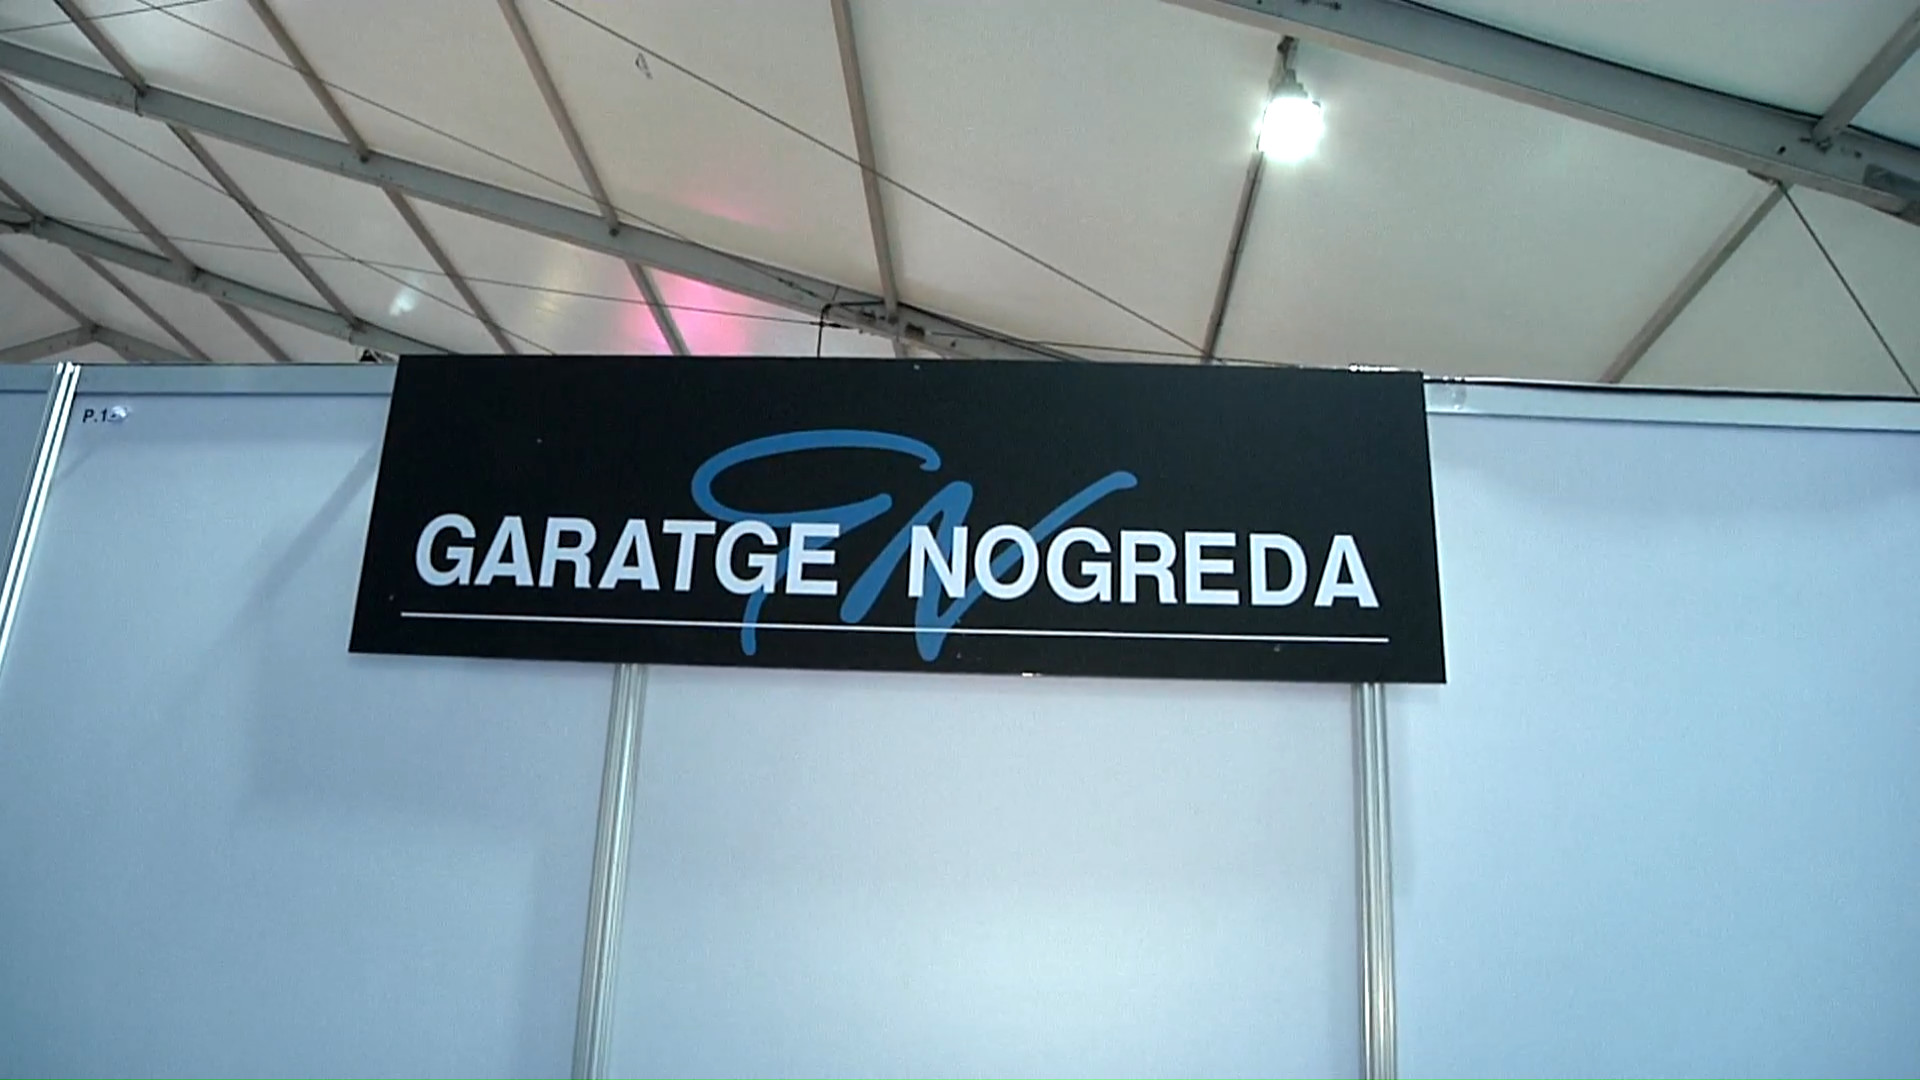 Garatge Nogreda